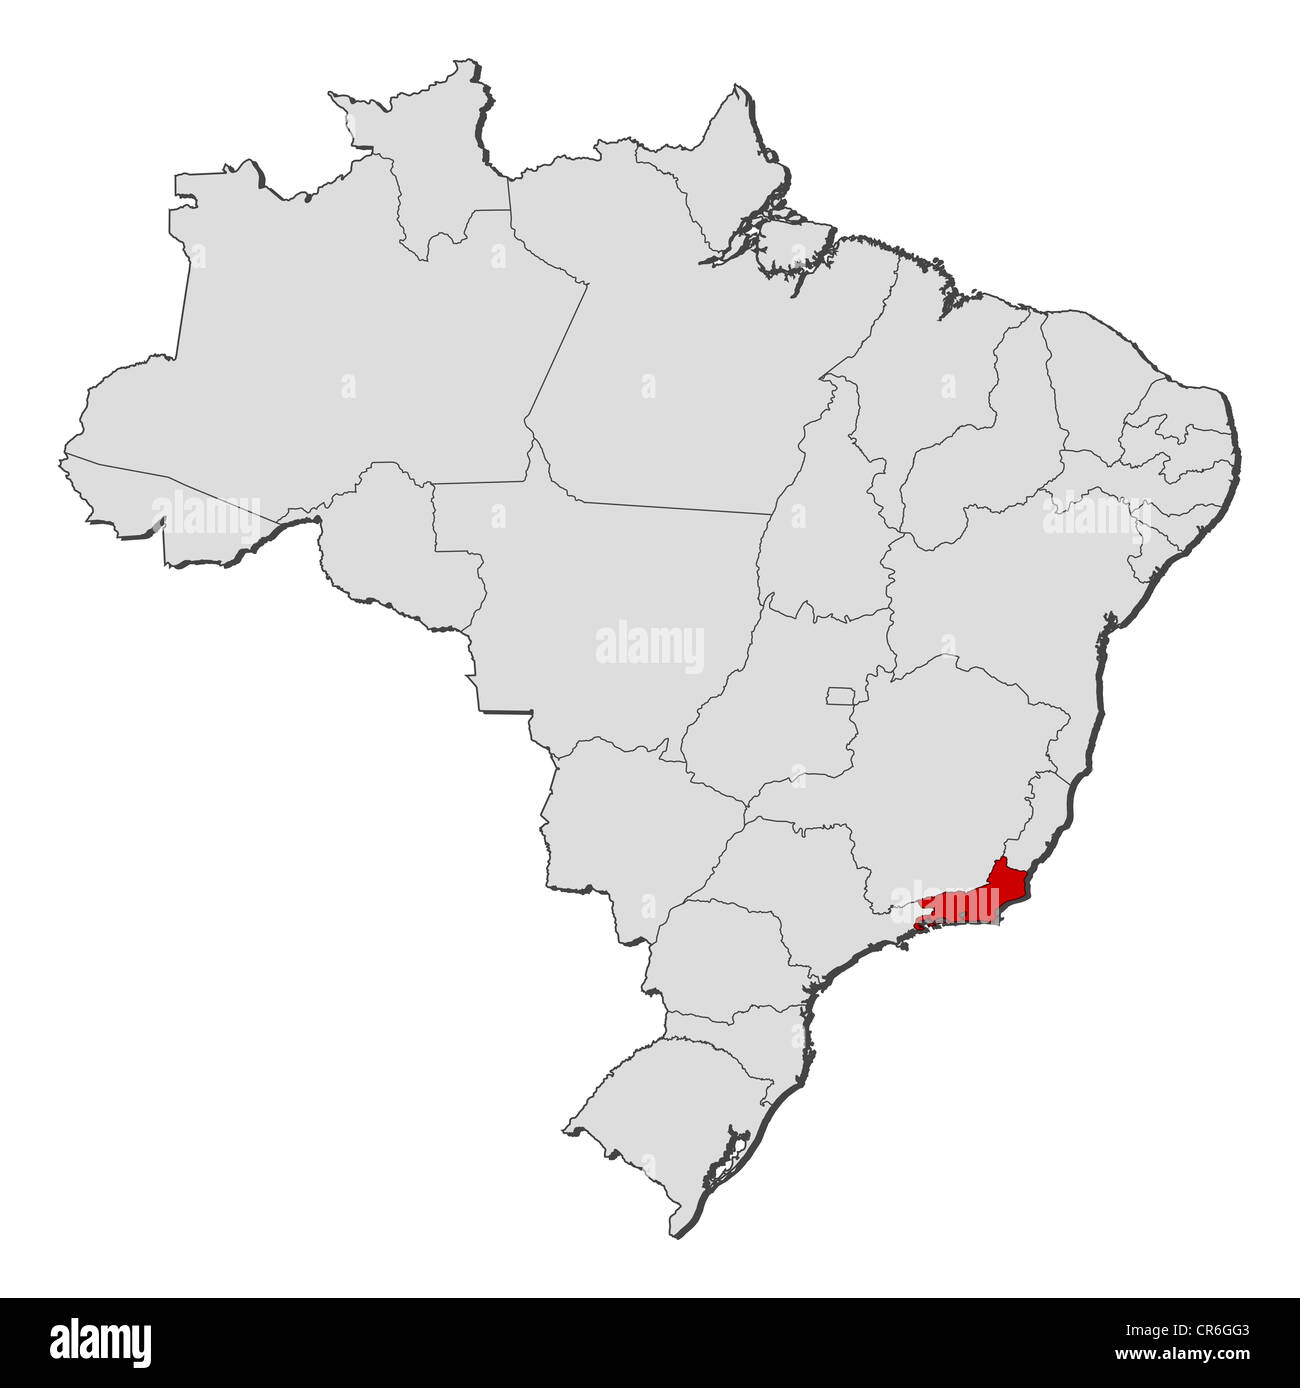 map of brazil rio Political Map Of Brazil With The Several States Where Rio De map of brazil rio